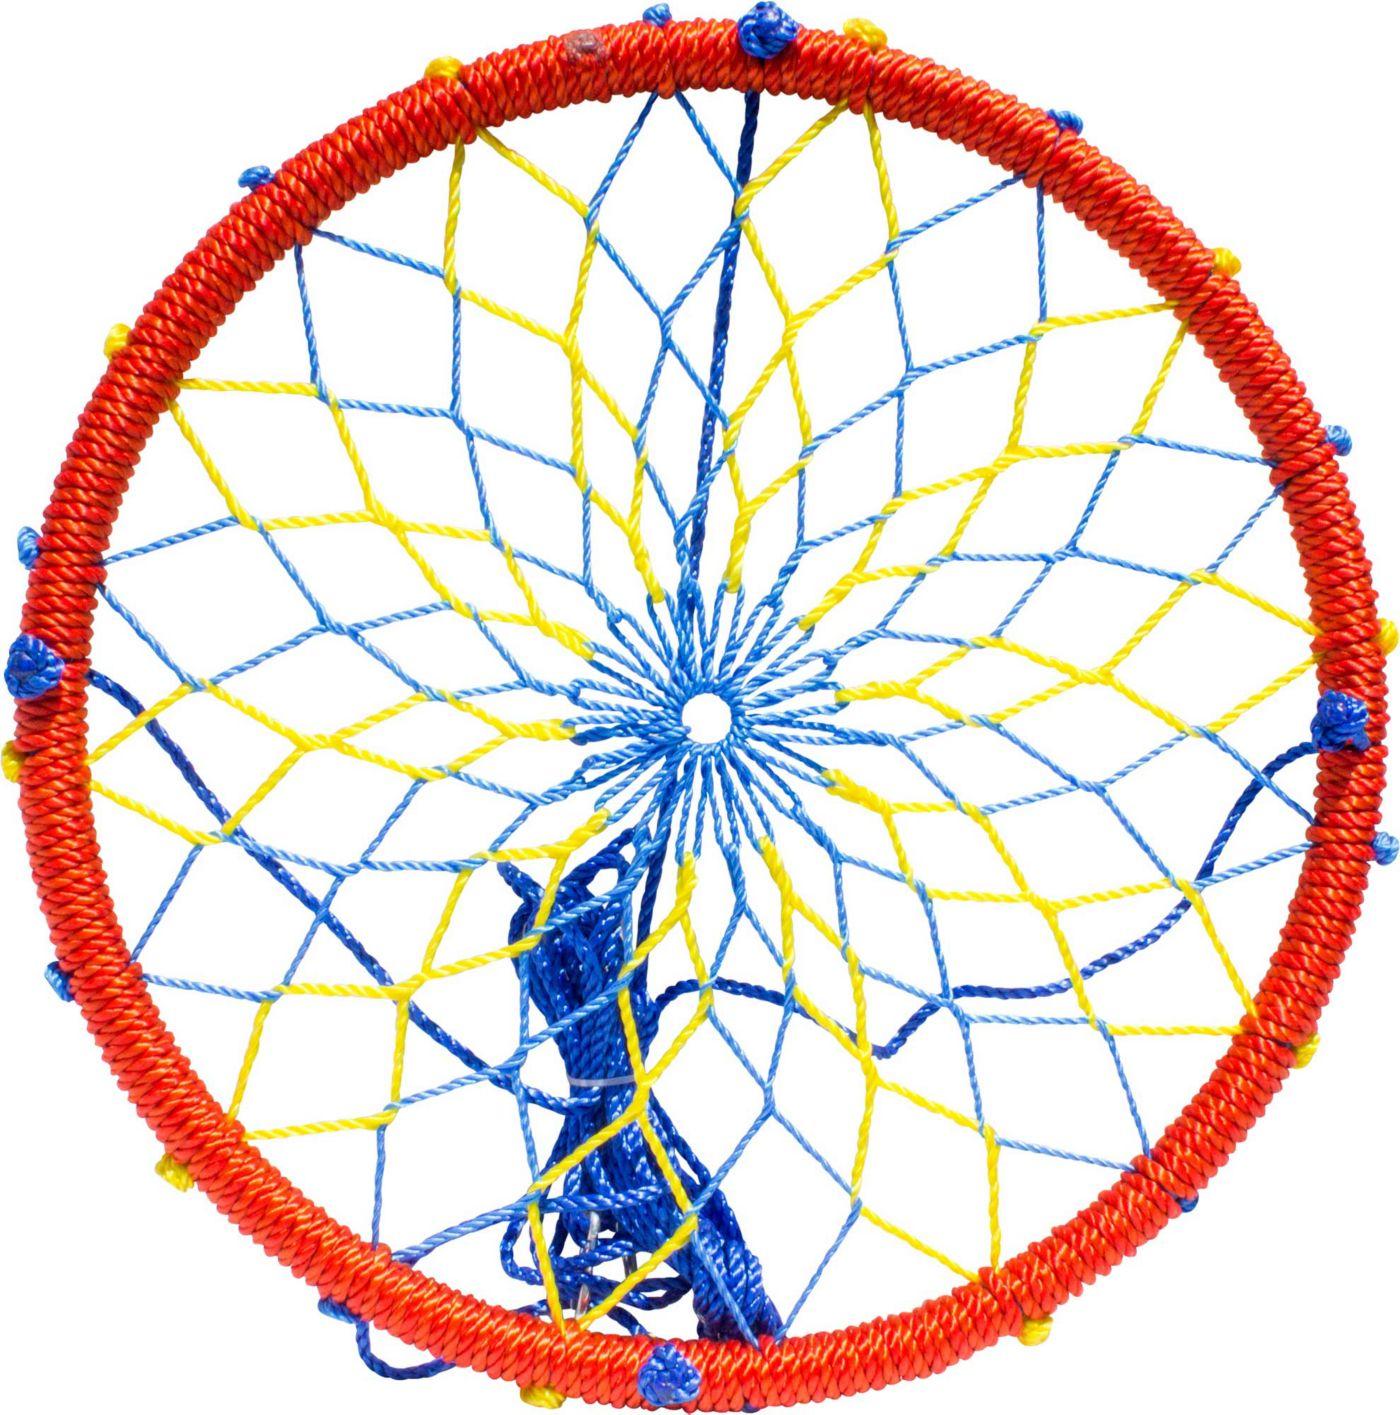 b4Adventure Sky Dreamcatcher Swing